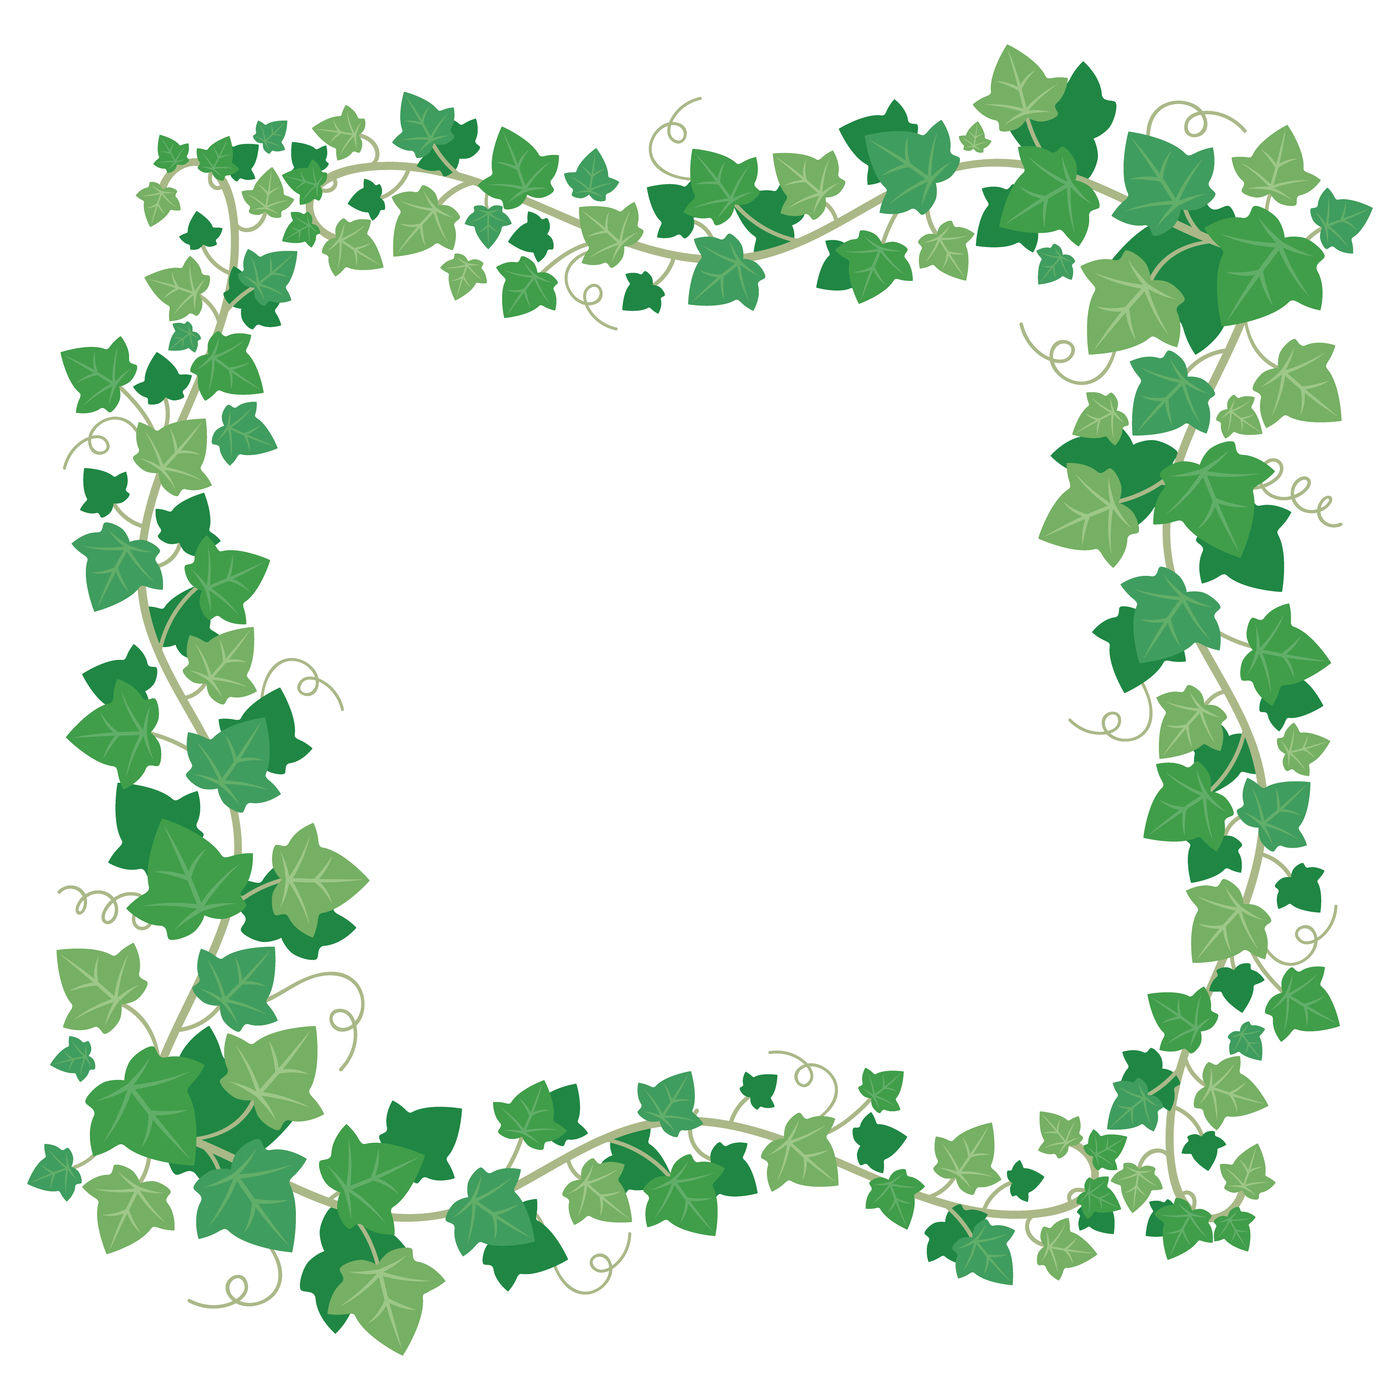 Vine Ivy Green Leaves Frame Climbing Plant Greenery Rectangular